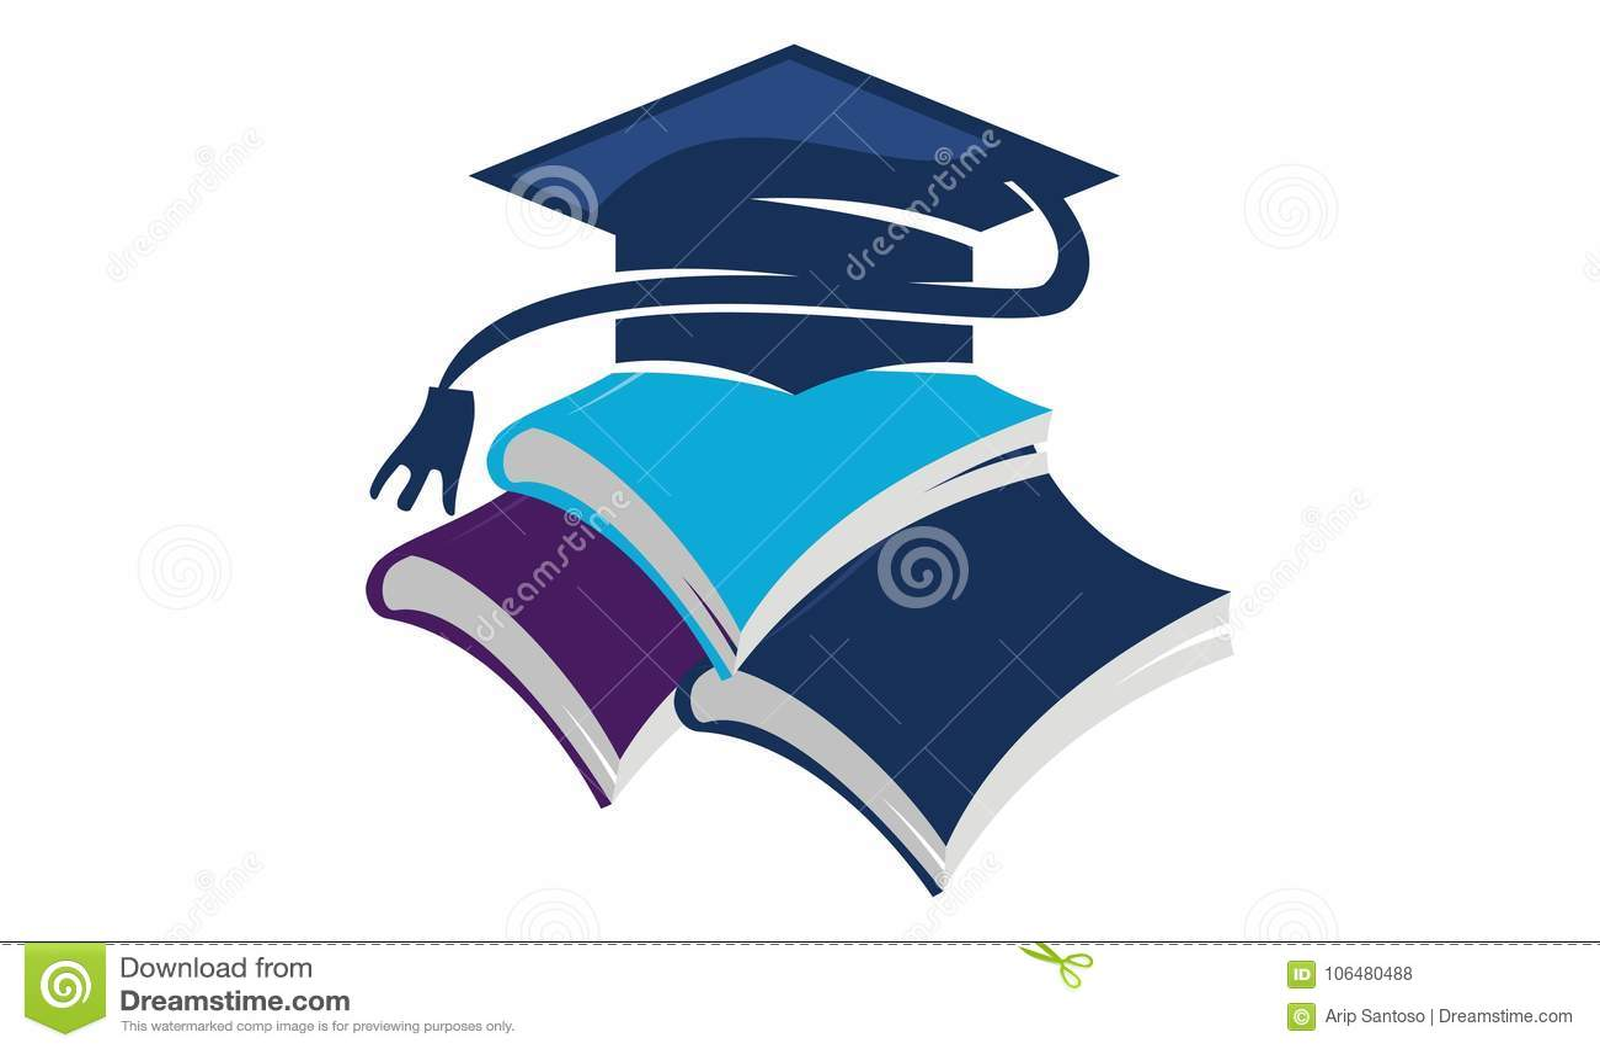 books graduation cap stock vector illustration of journal 106480488